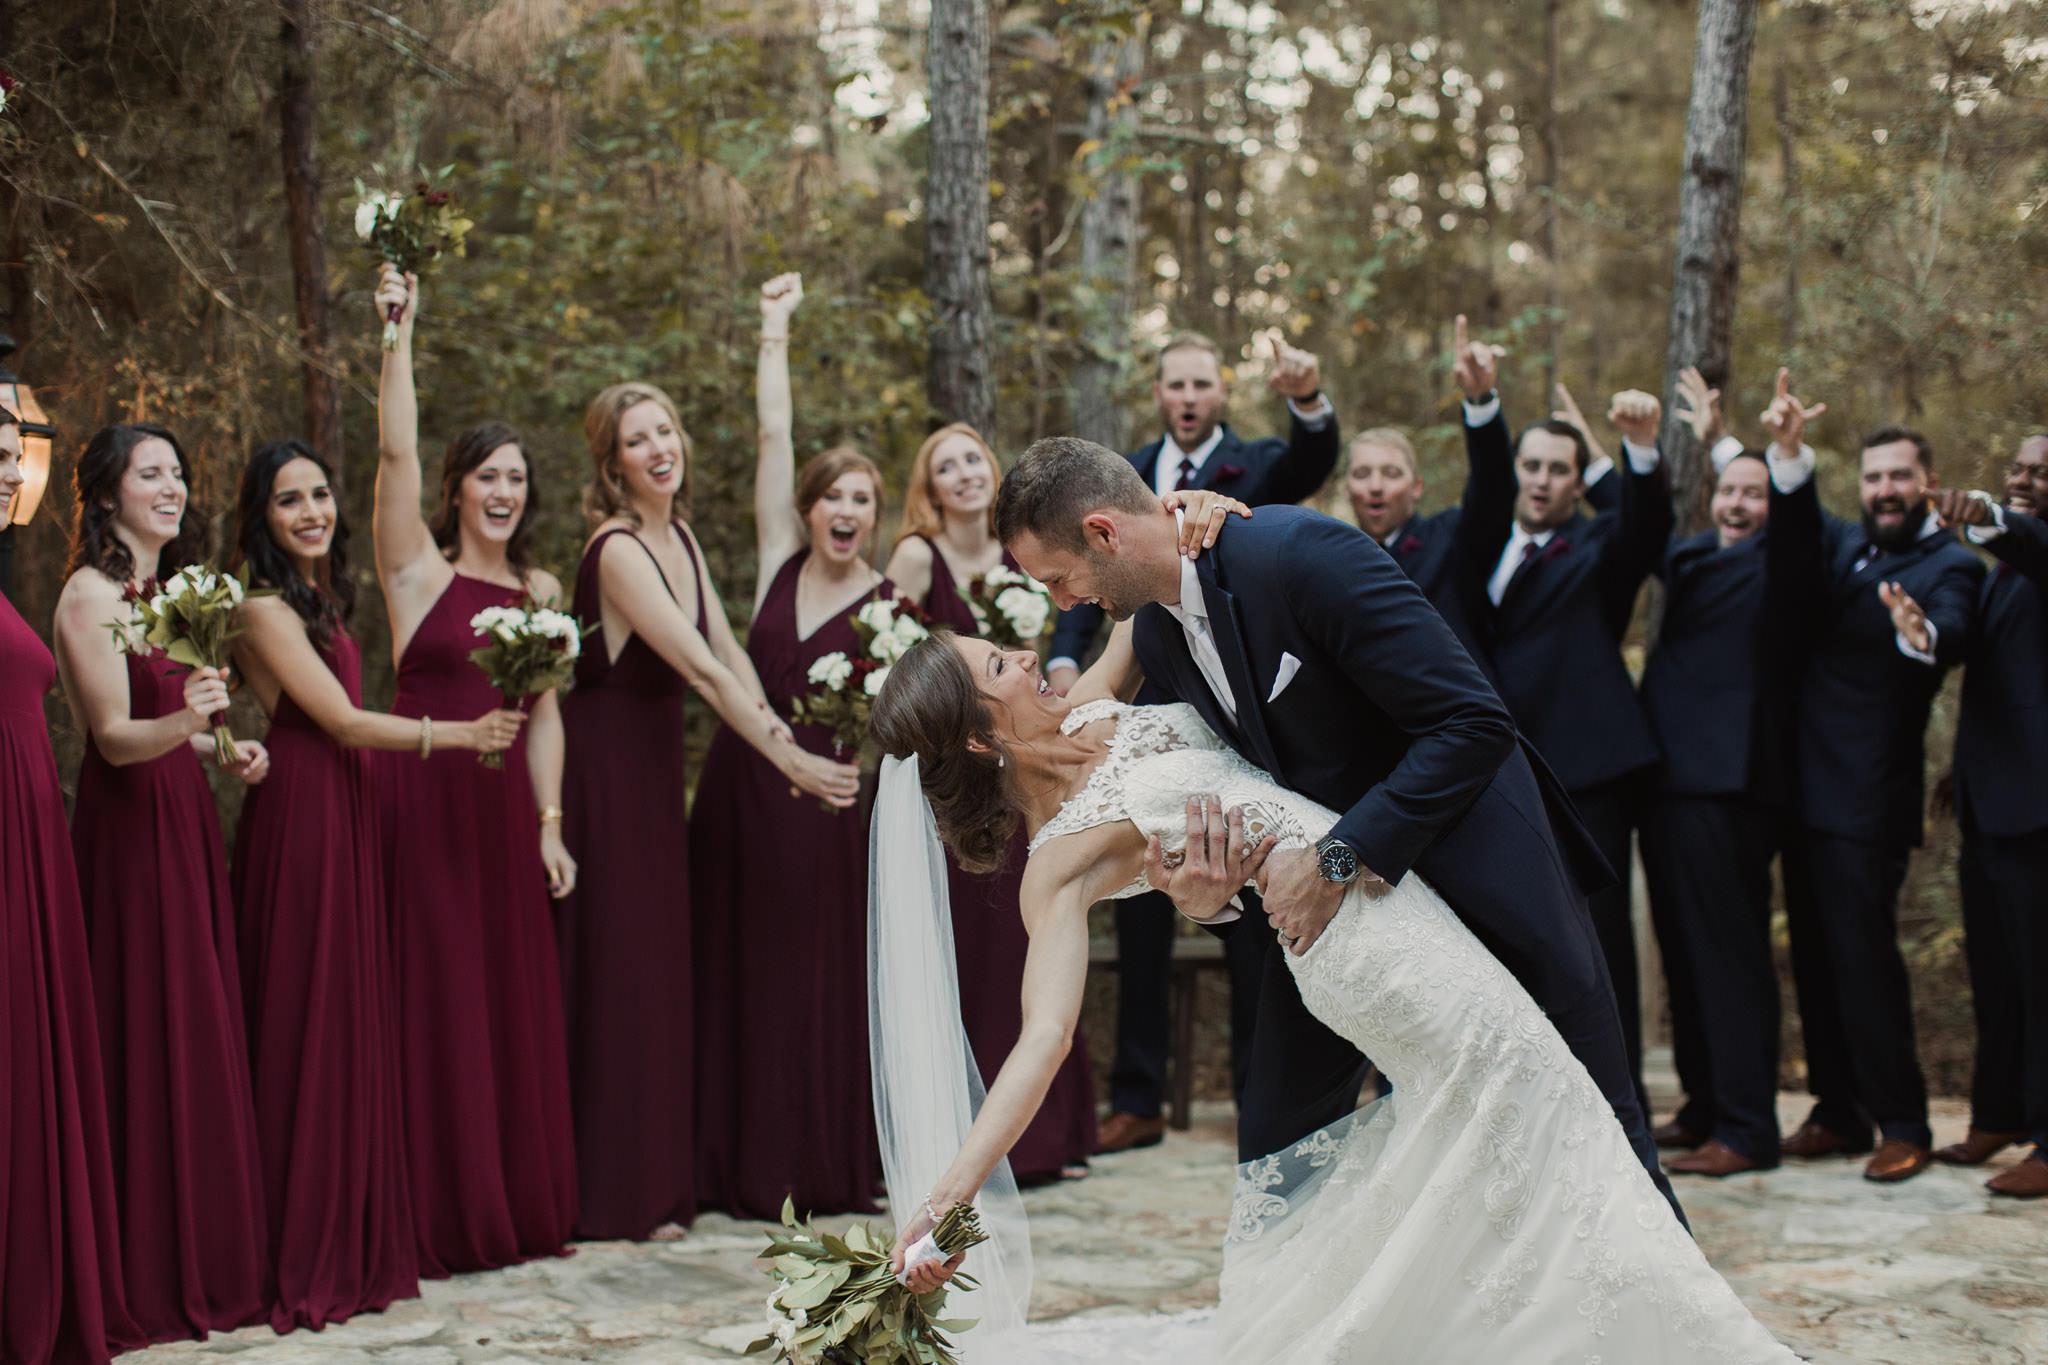 nichole-kyle-magnolia-bells-magnolia-wedding-sm-117.jpg